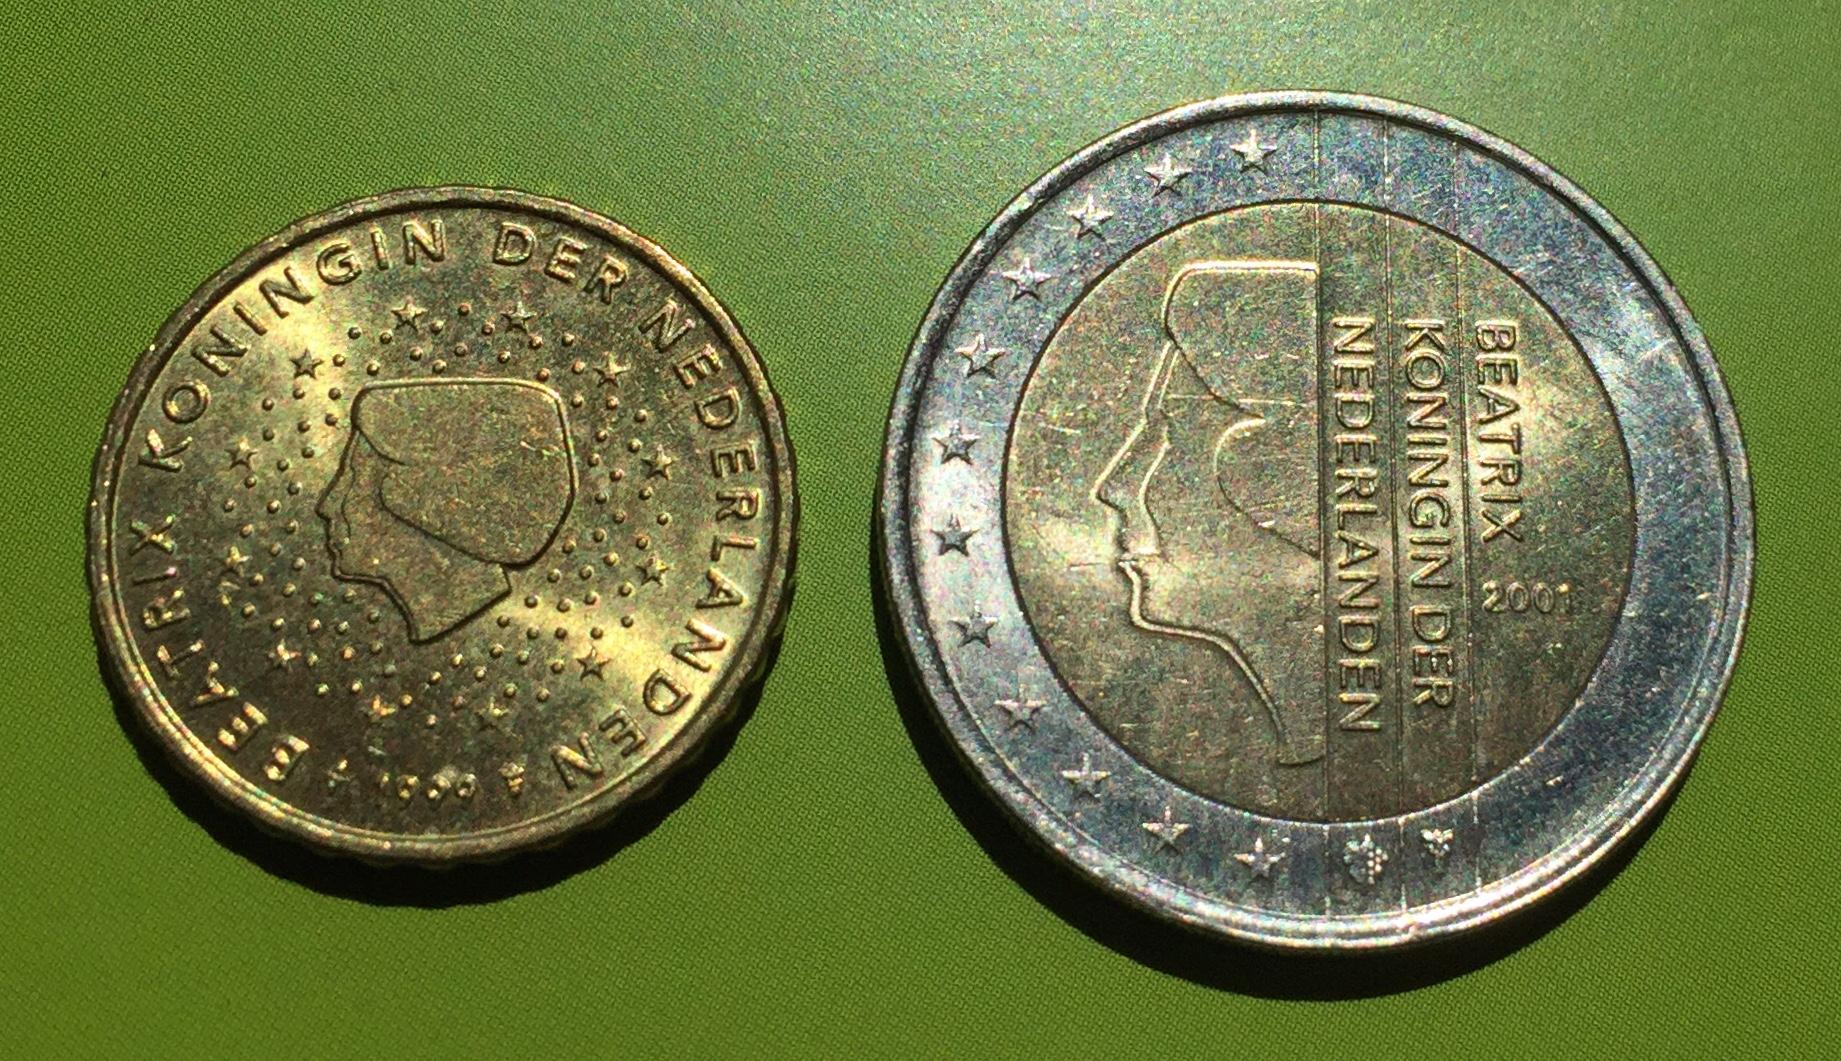 NL 10 Cent 1999 & 2€ 2001.jpg